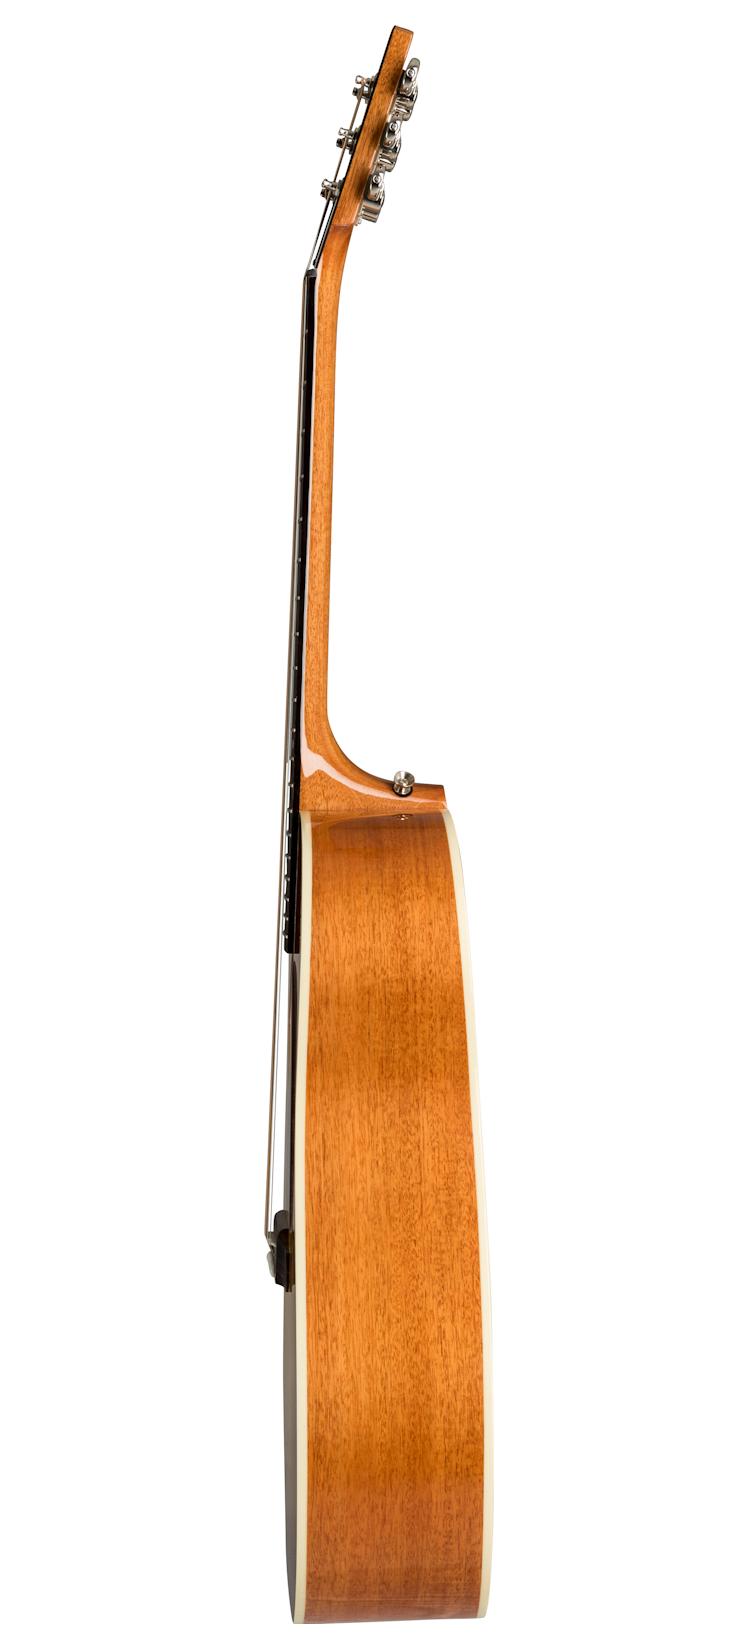 Gibson NEW Gibson J-45 Standard 2019 - Heritage Cherry Sunburst (094)